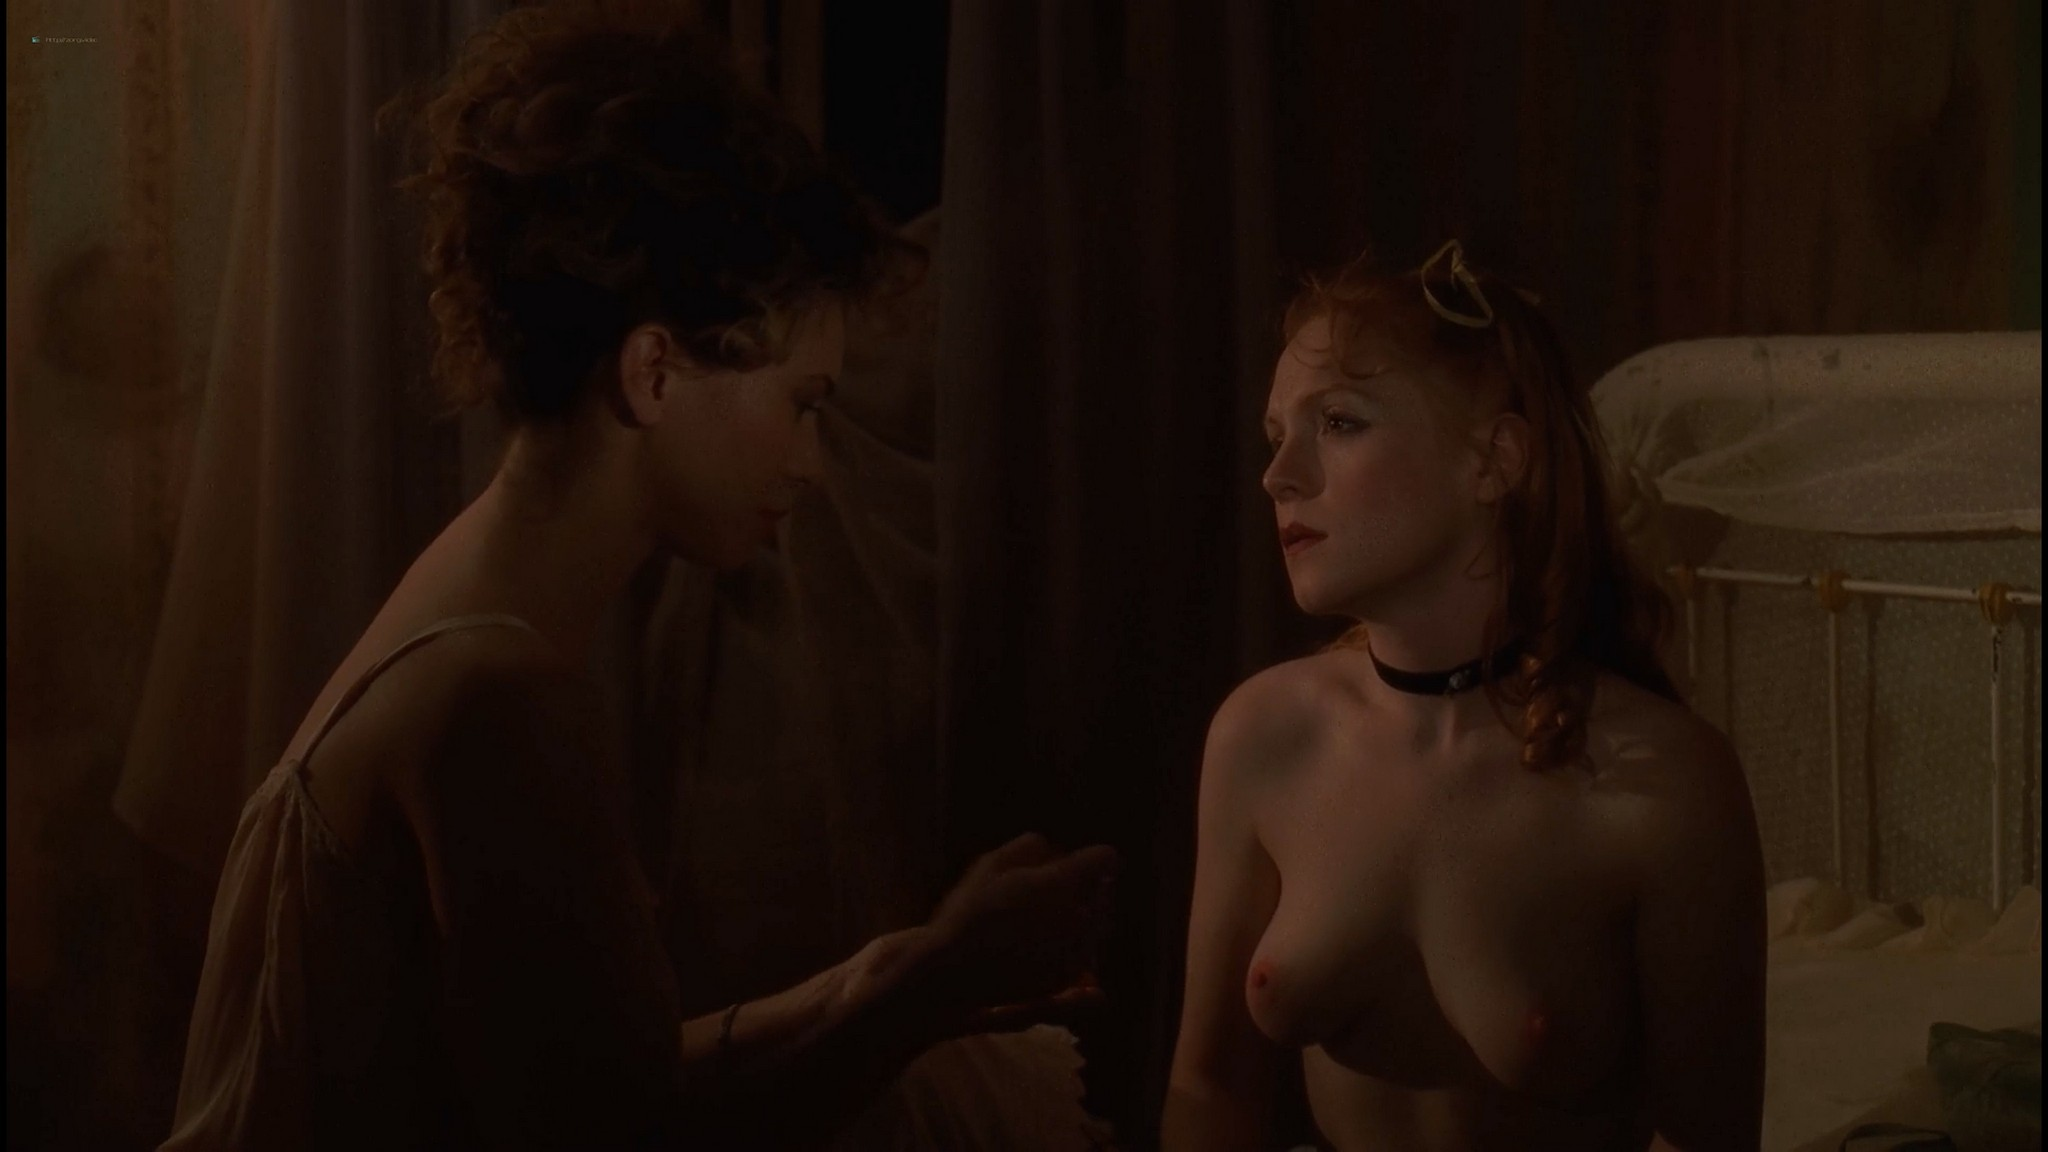 Serena Scott Thomas nude sex Sarah Lassez and others nude too Brothel 2008 1080p Web 7